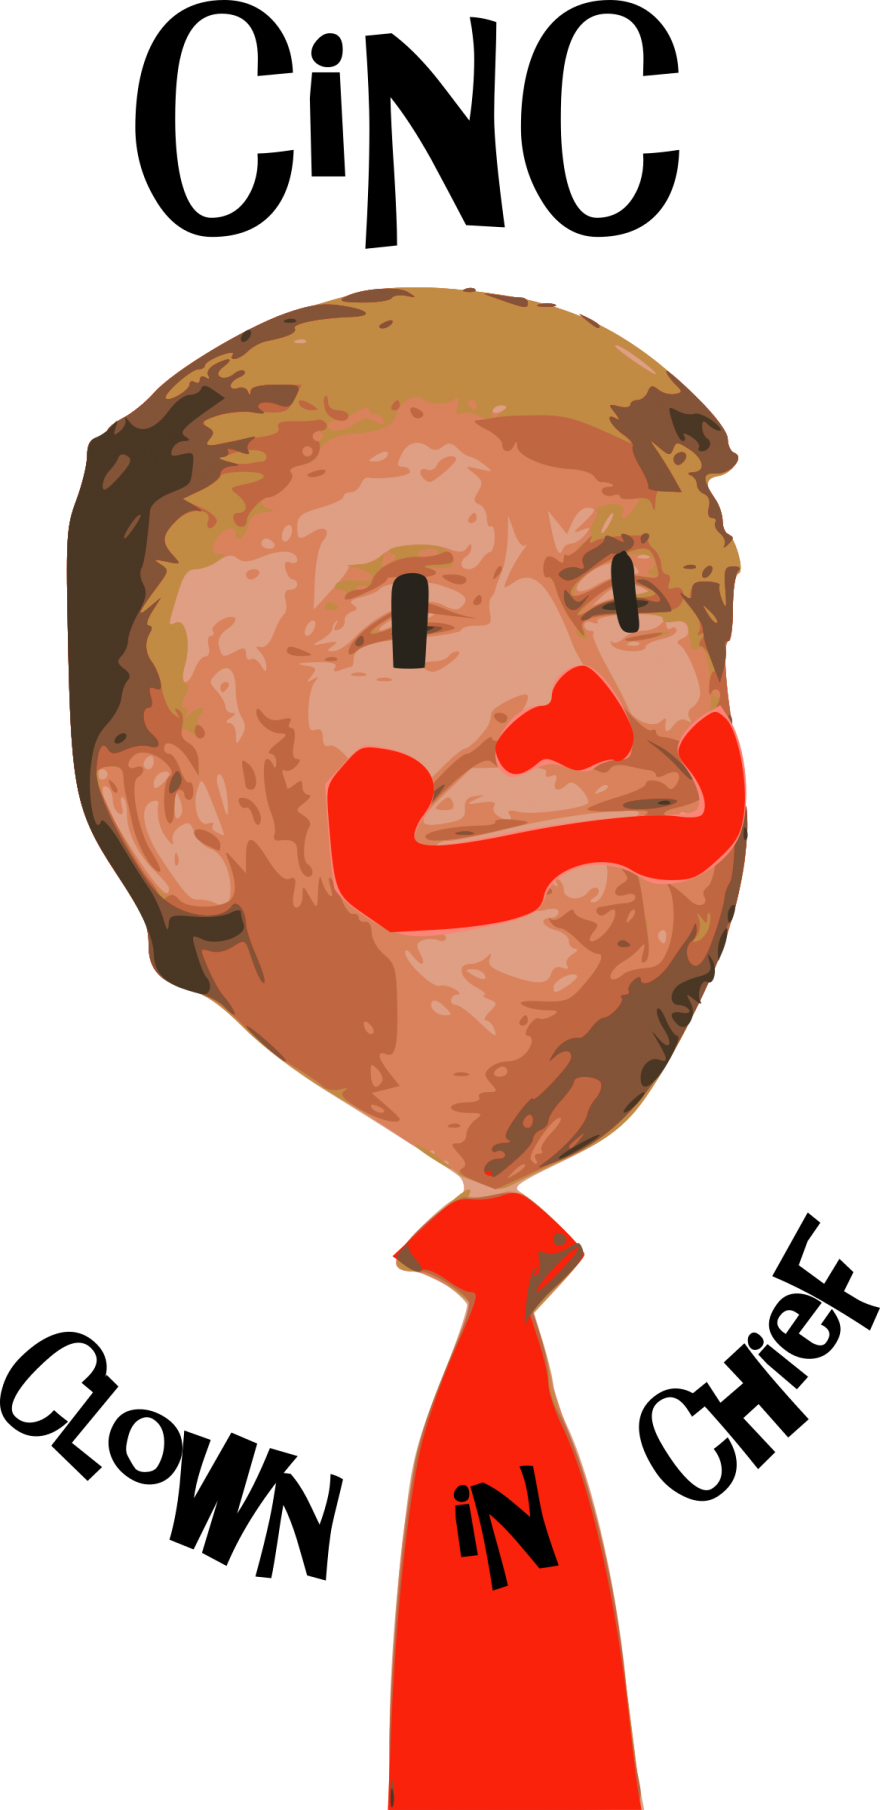 880x1810 Clown In Chief, Donald Trump Face Vector Clipart Clown In Chief